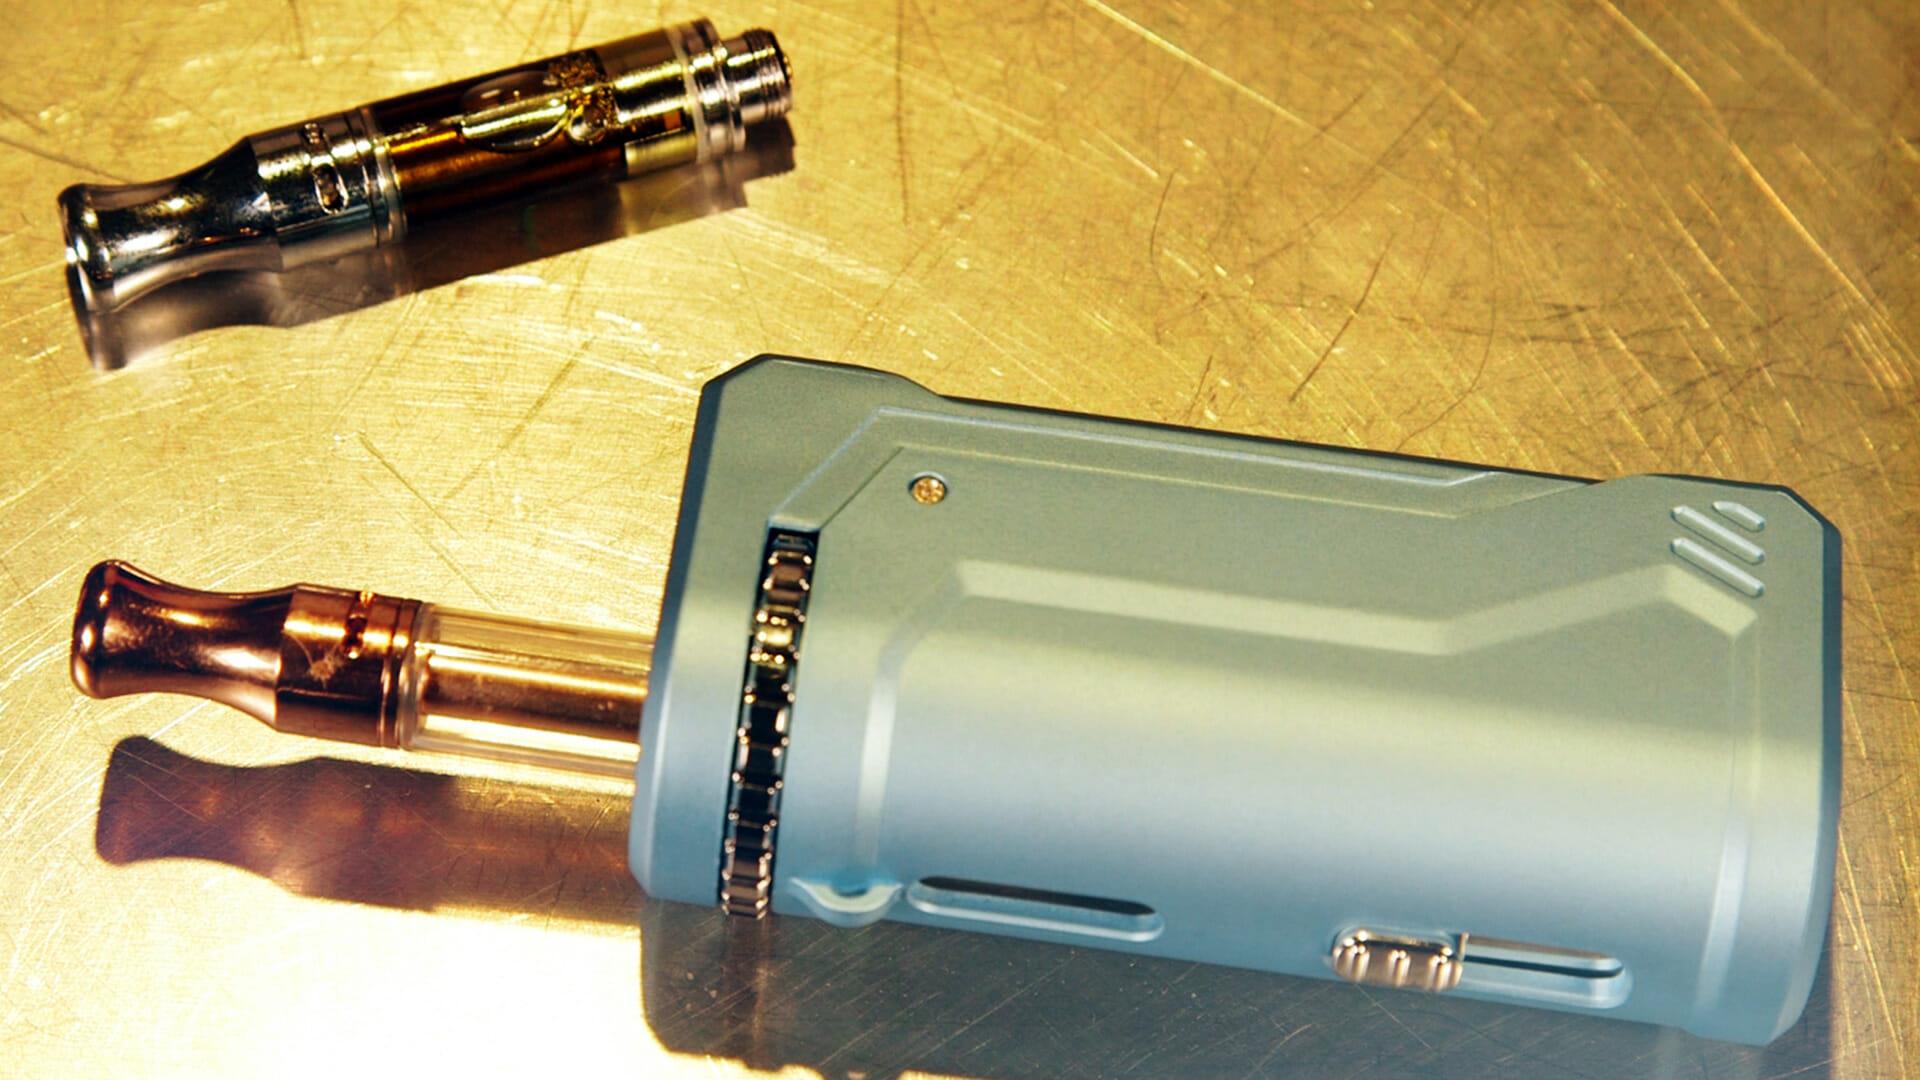 yocan-uni-cartridge-vaporizer-review-thumbnail-1